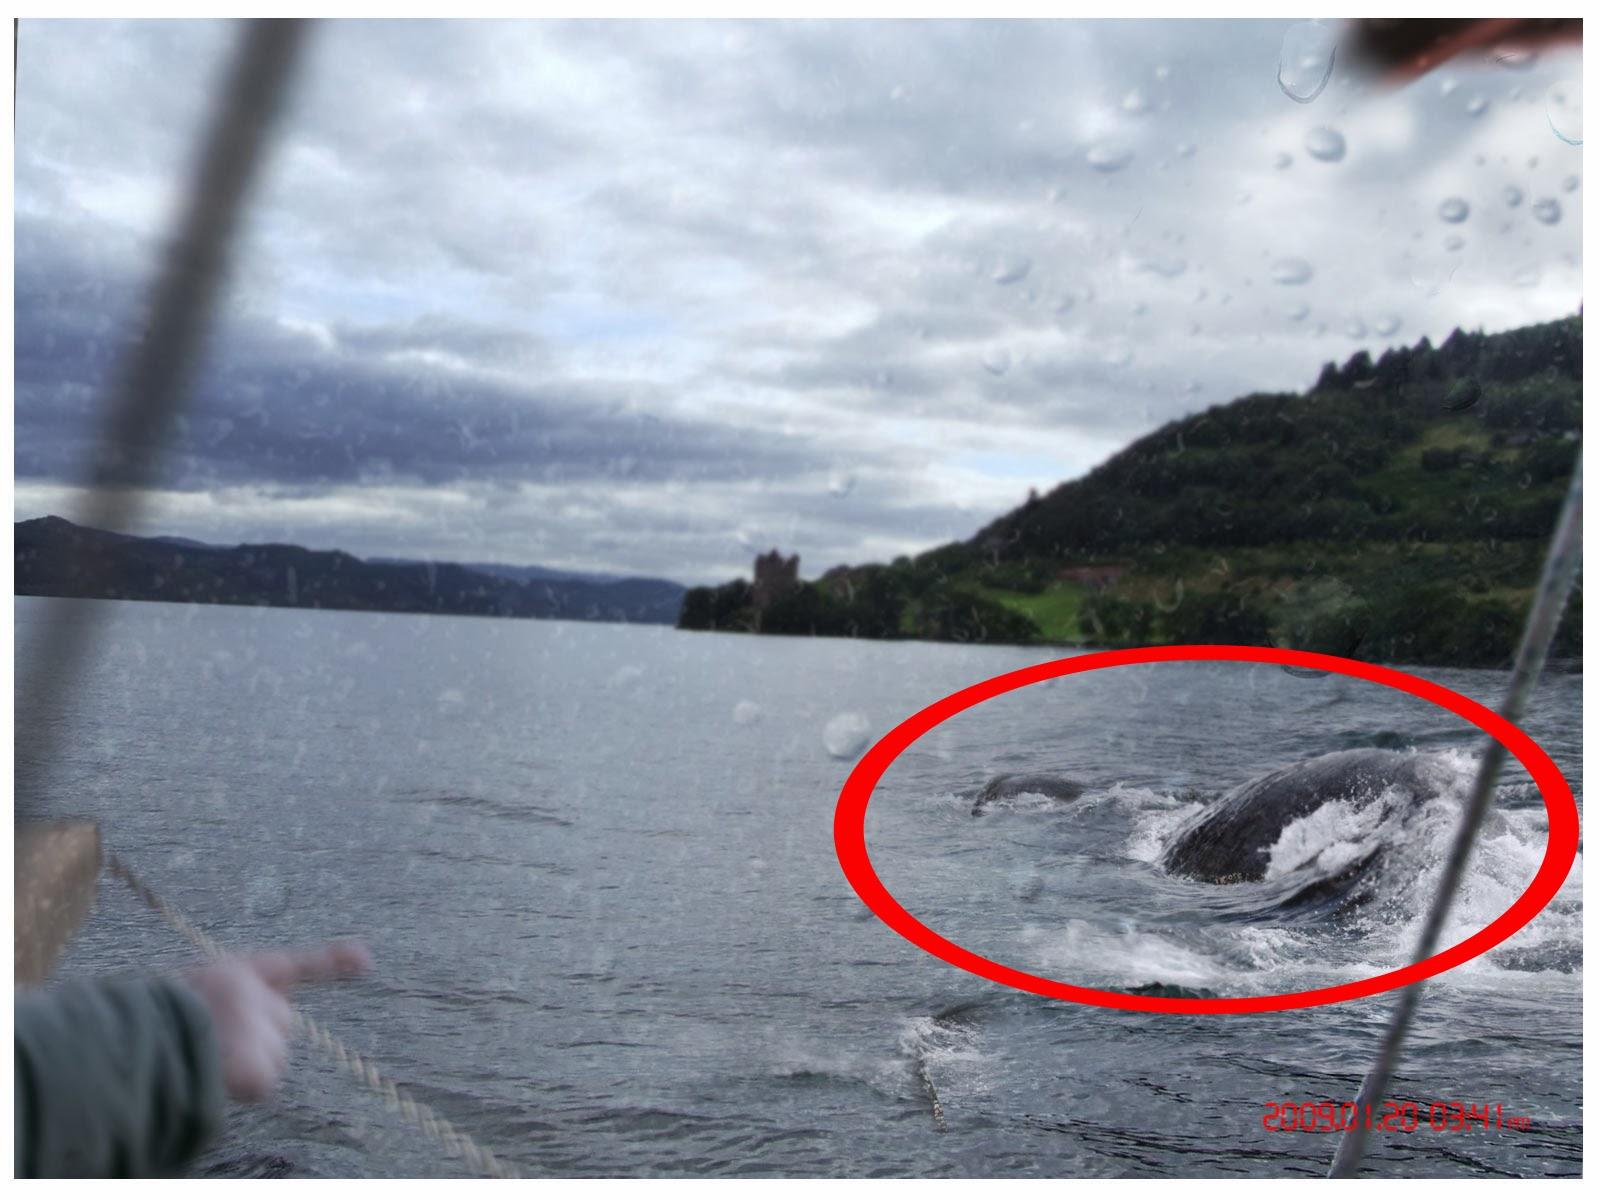 Loch Ness Monster Sightings 2014 Loch ness monster sightings